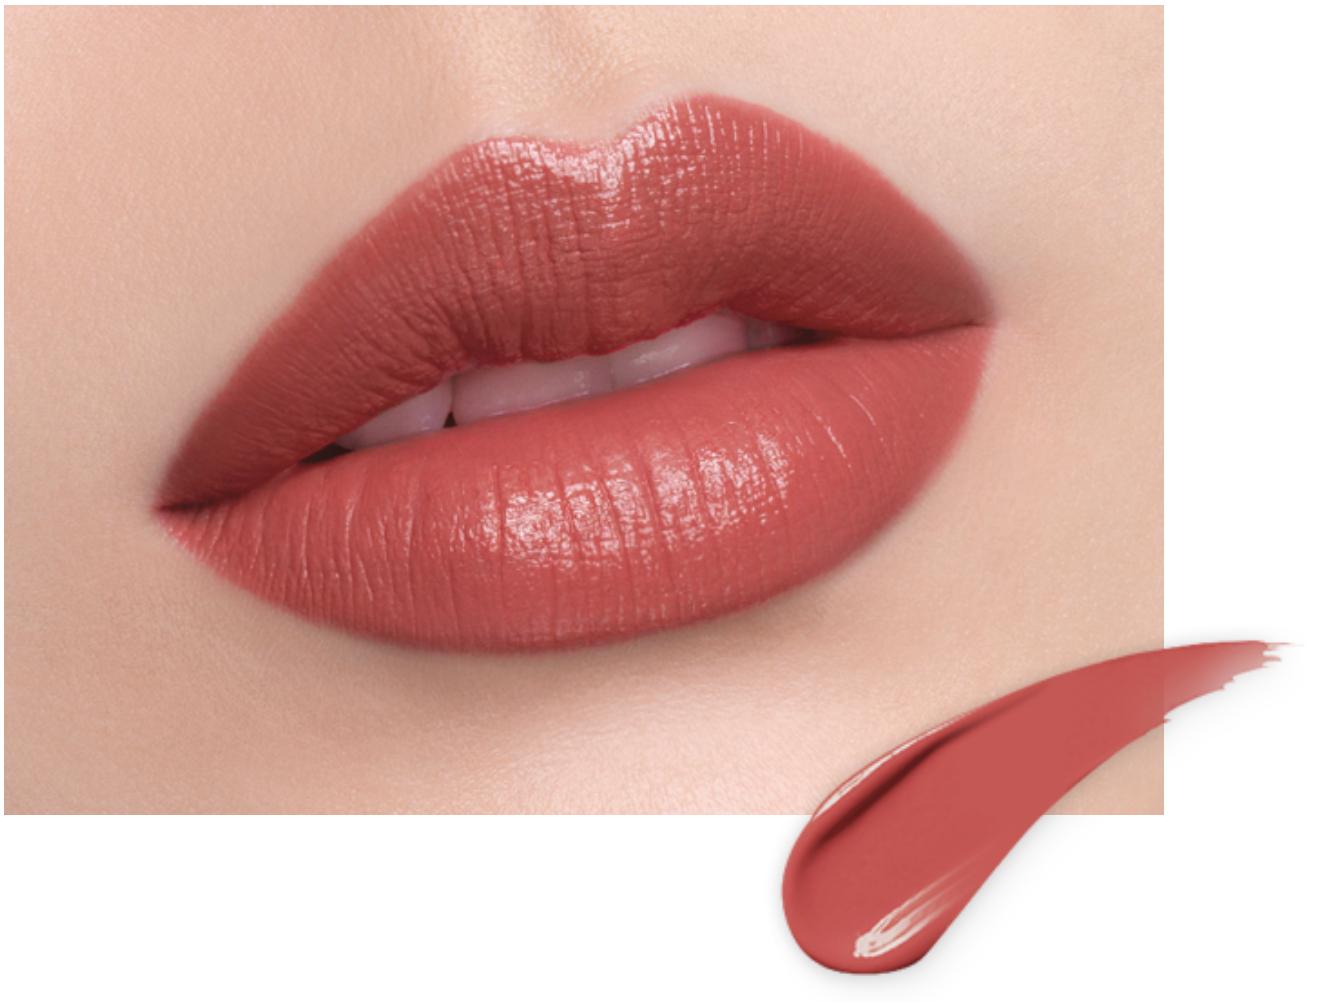 laneige-silk-intense-lipstick-520.png